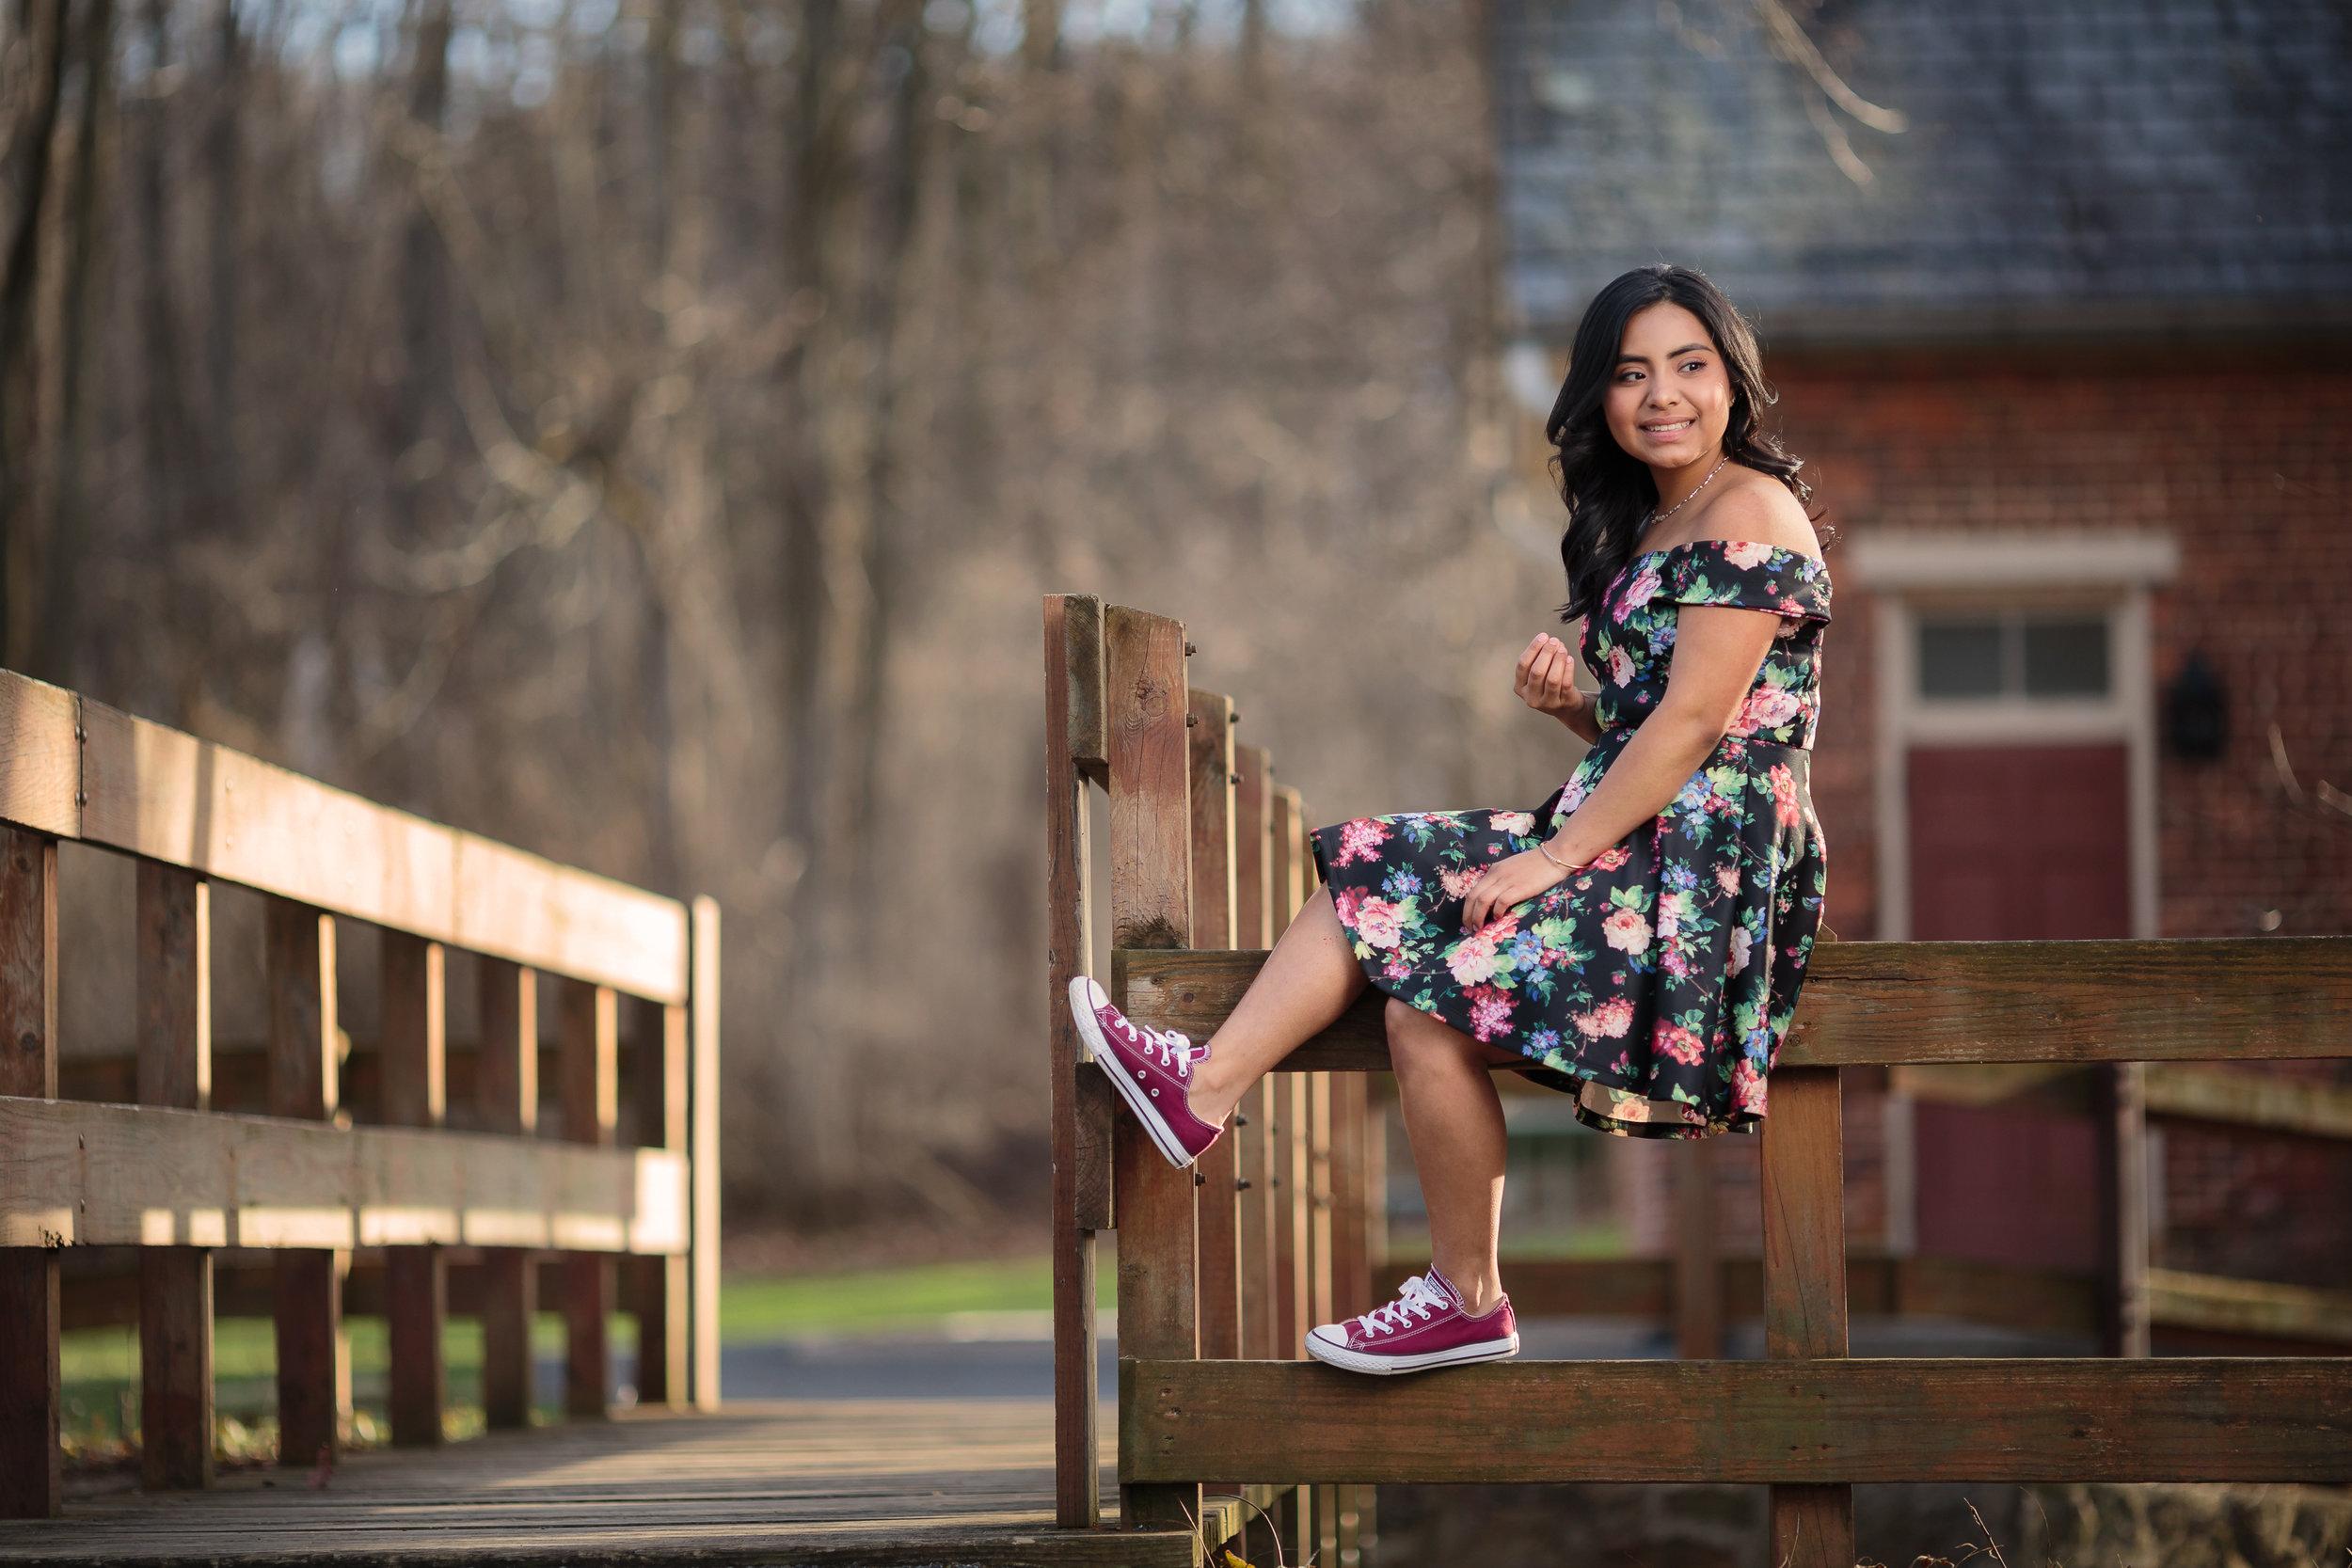 Rosalie-Sanchez-Senior-Garcia-Photography-6931.jpg